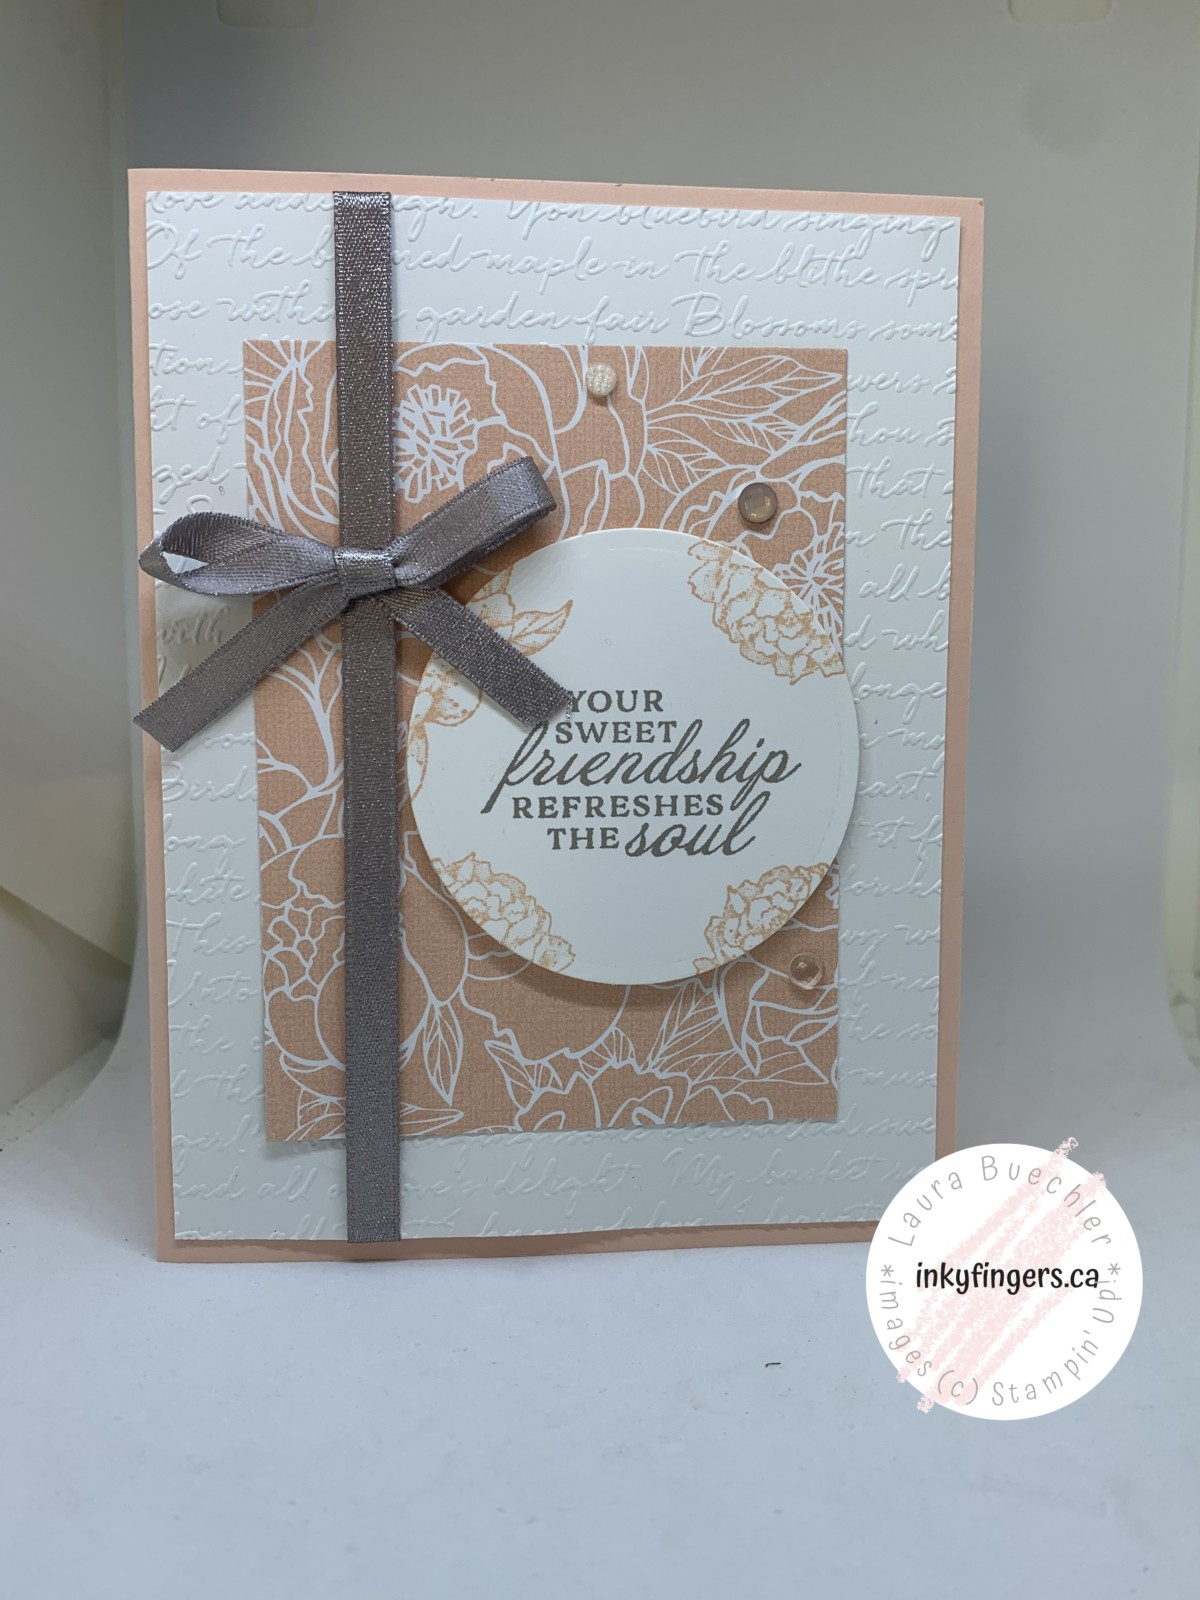 Designer Series PaperSale!